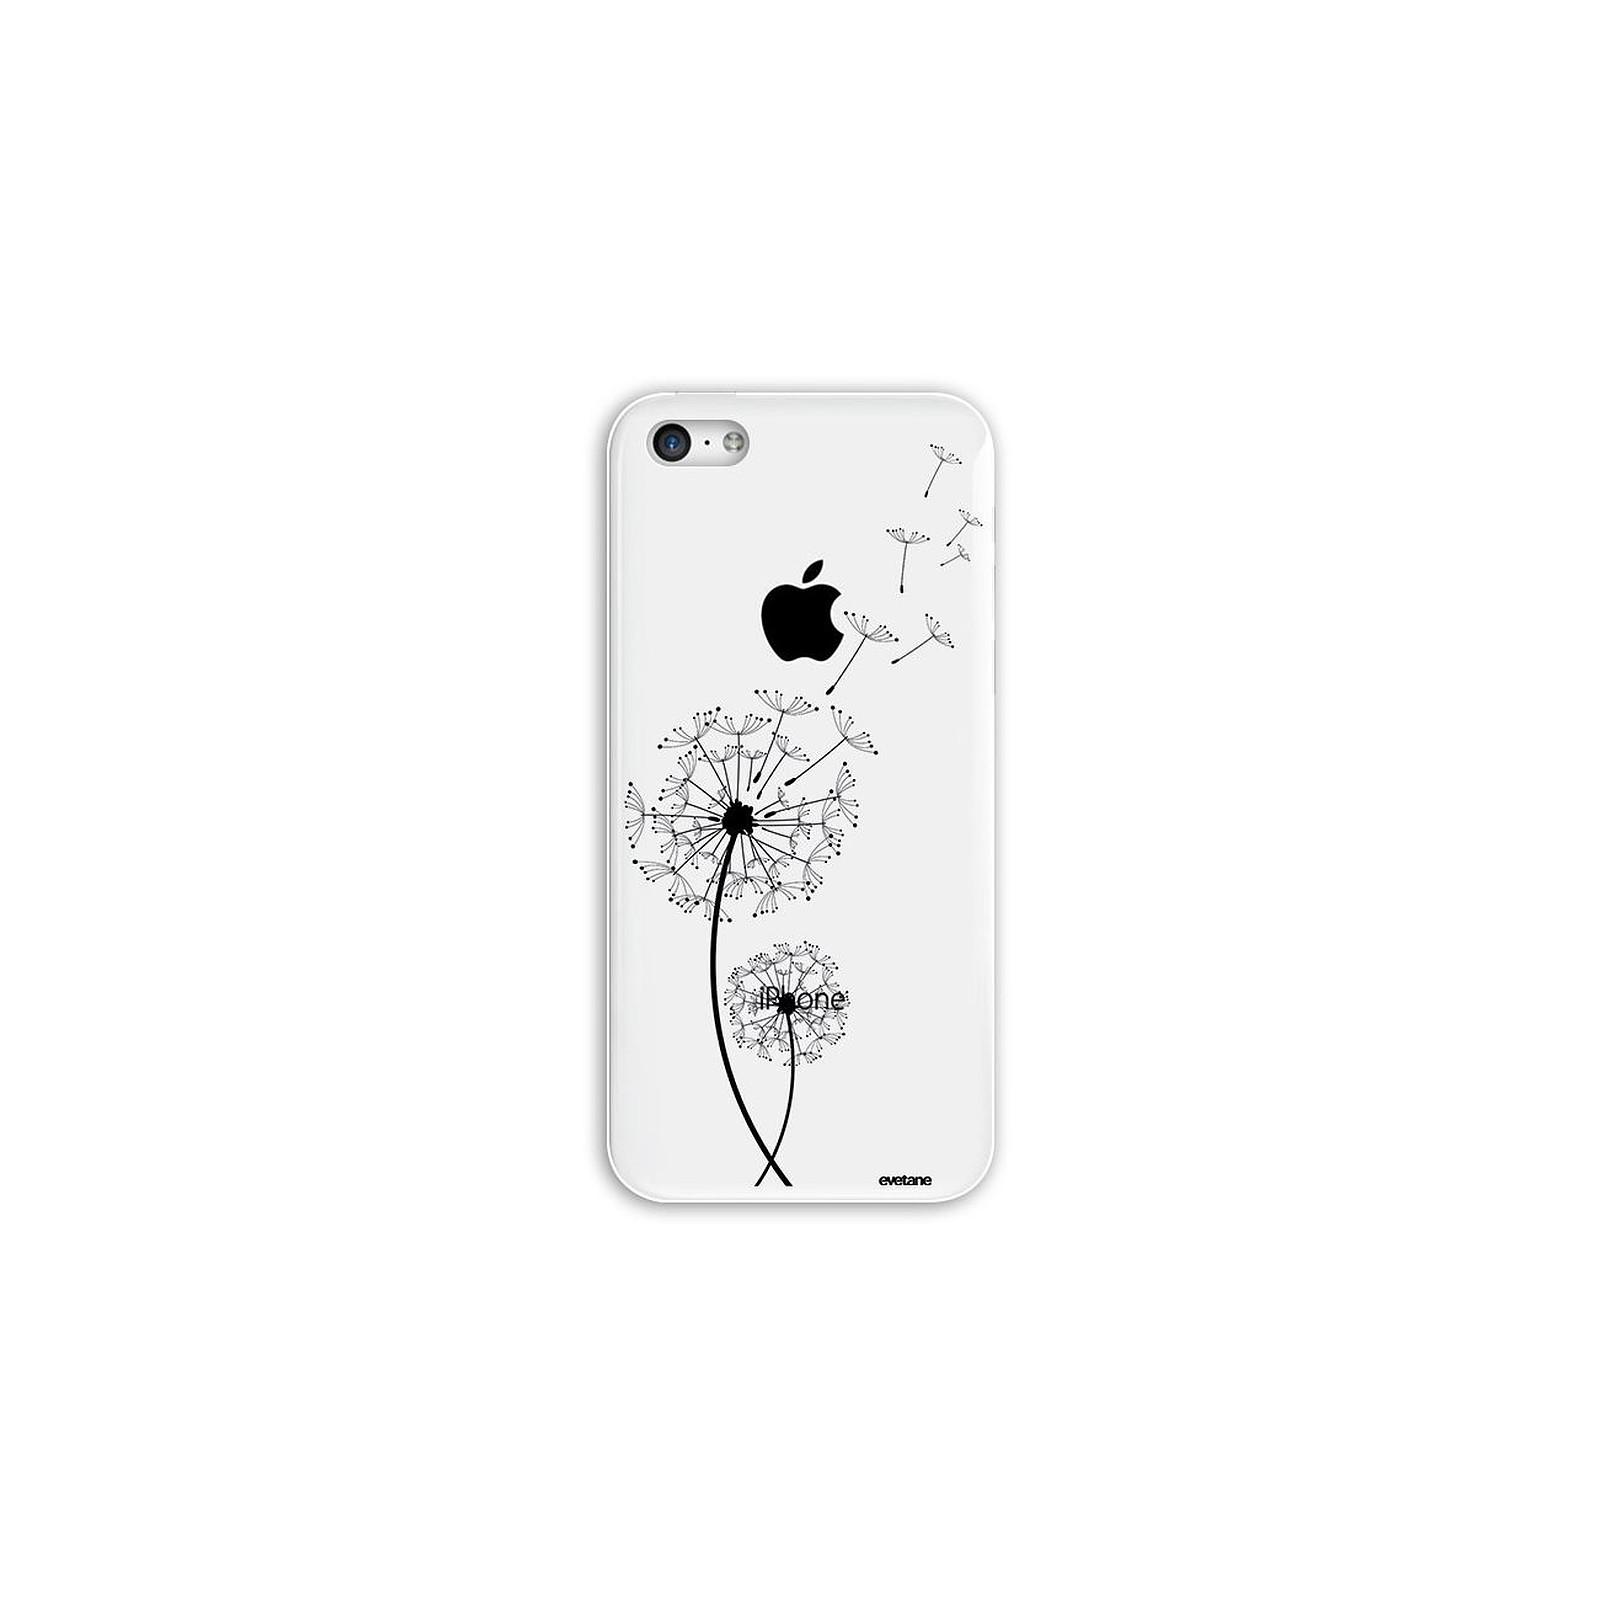 EVETANE Coque iPhone 5C rigide transparente Pissenlit Dessin - Coque téléphone Evetane sur LDLC